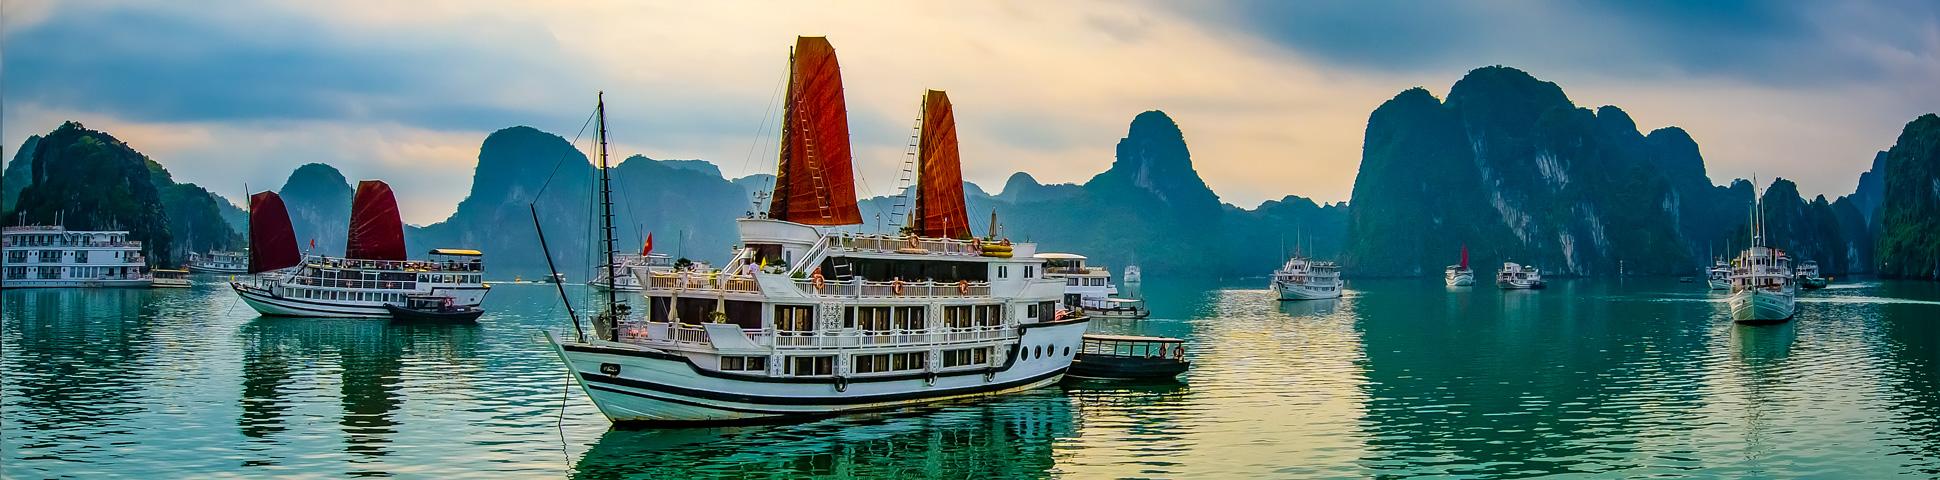 Panoramic view from Vietnam Adventure Tour